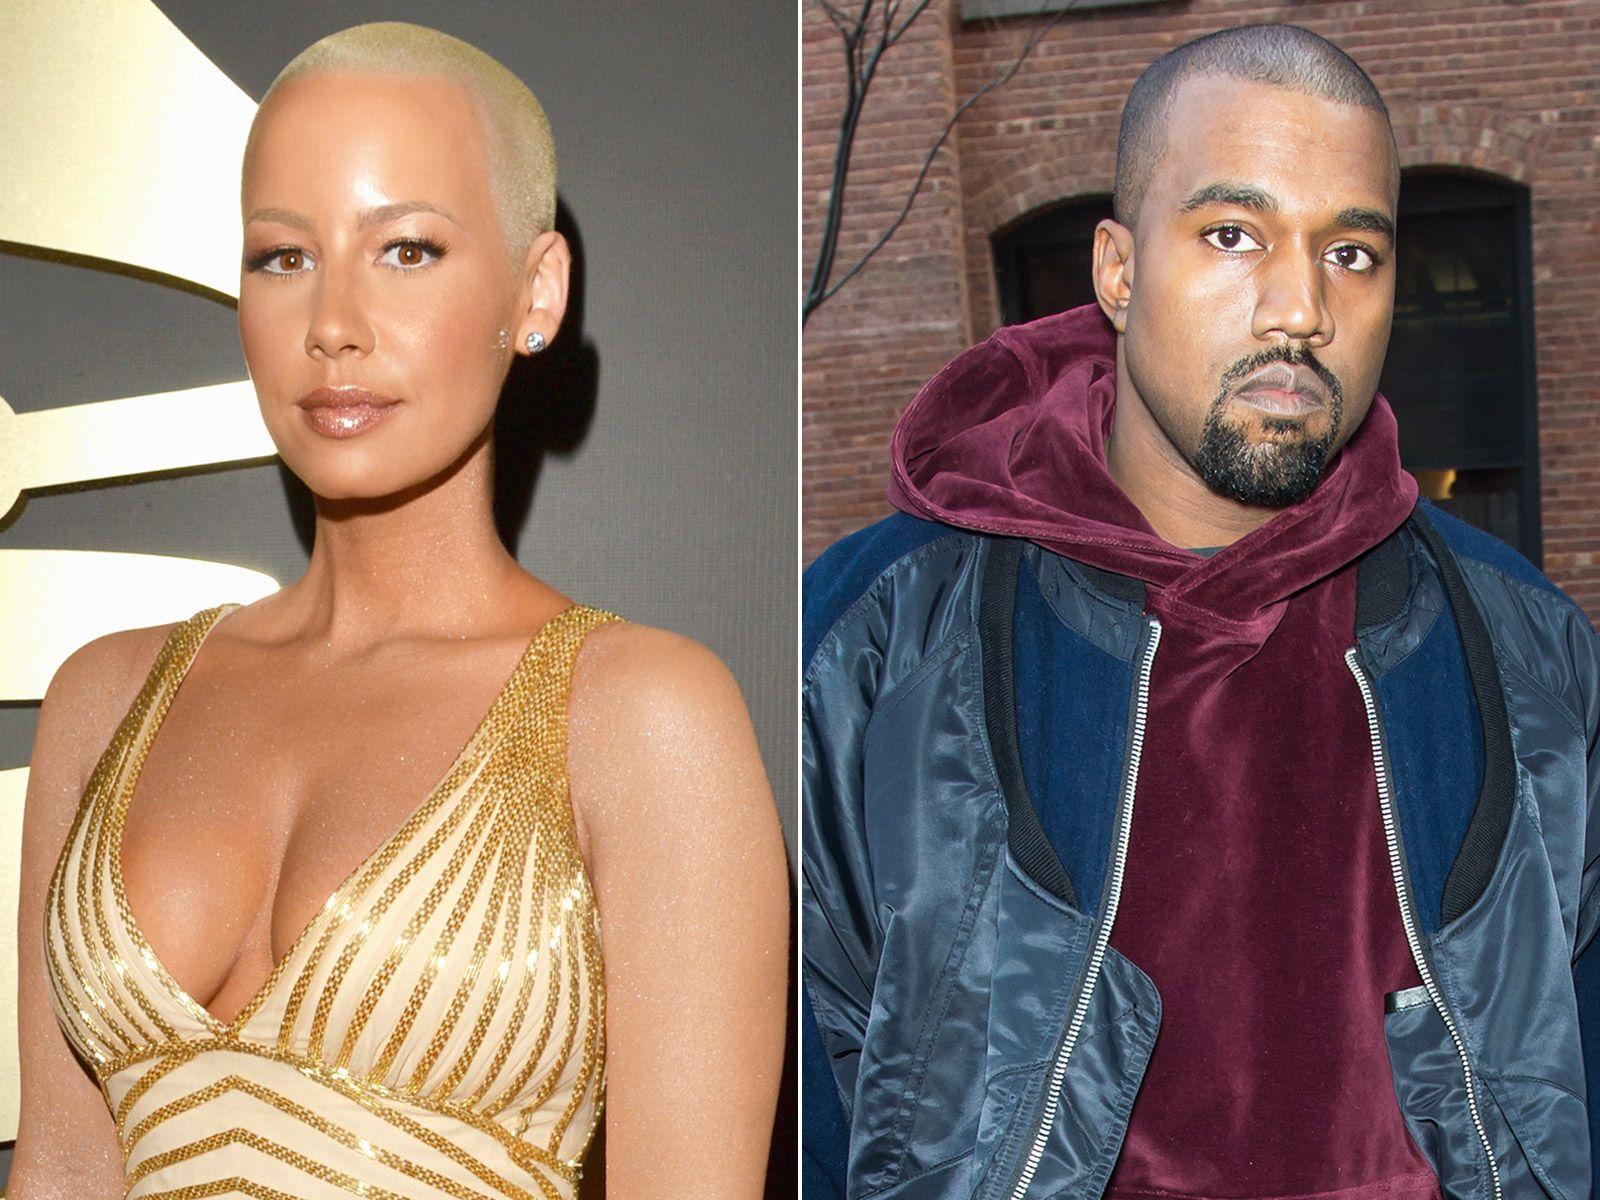 Read Amber Rose's Shocking Twitter Rant Against Kanye West